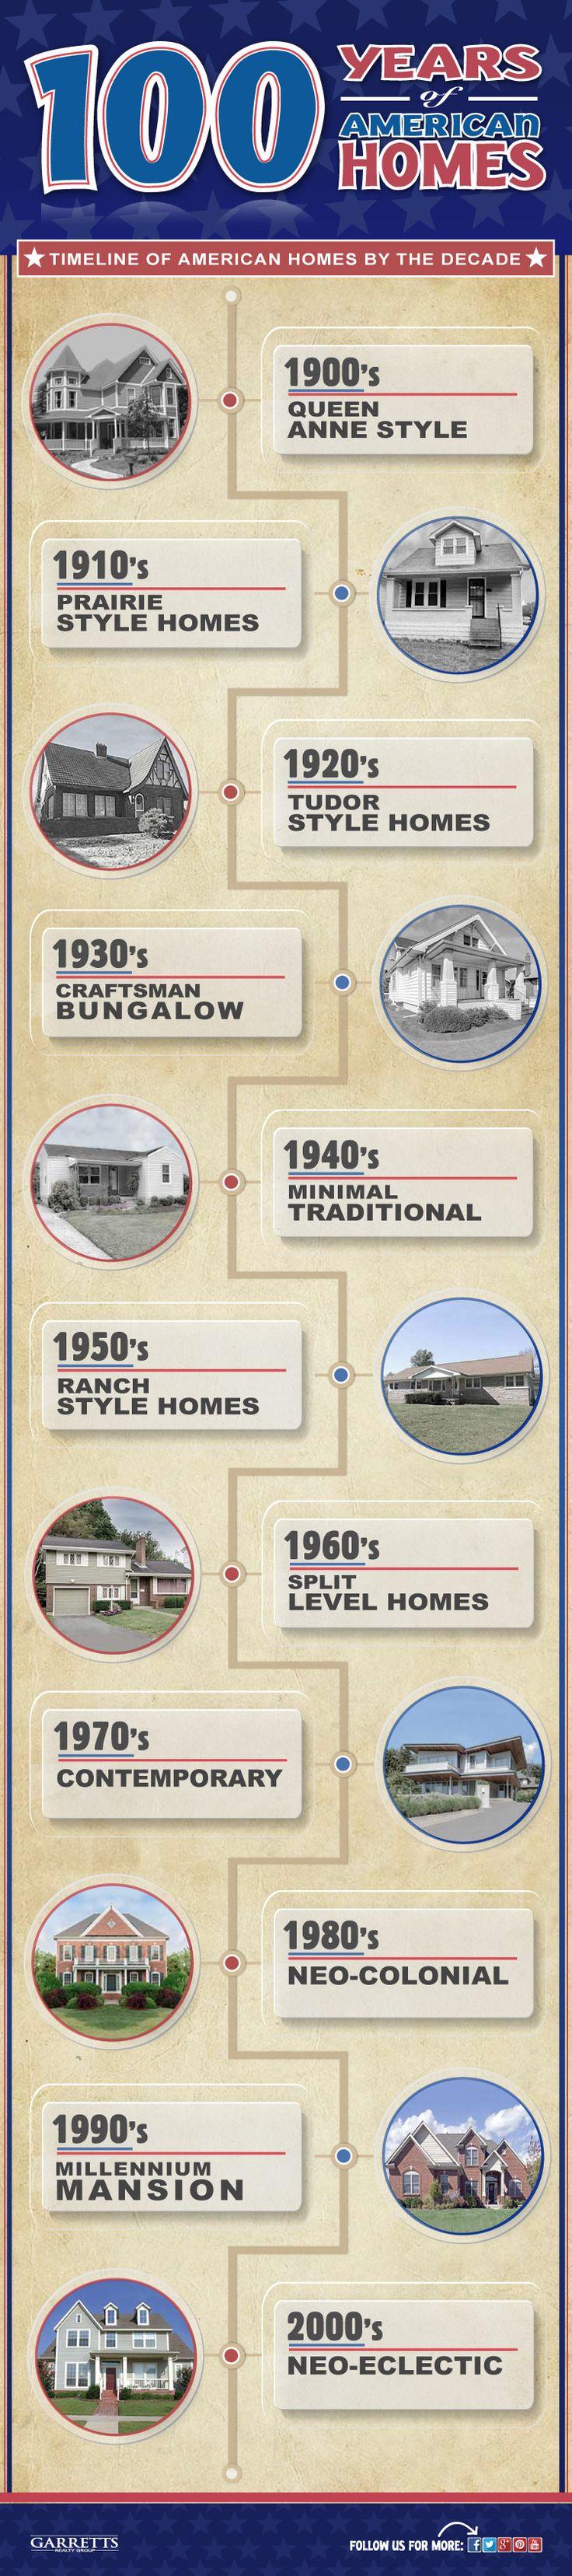 Evolution of Homes in America